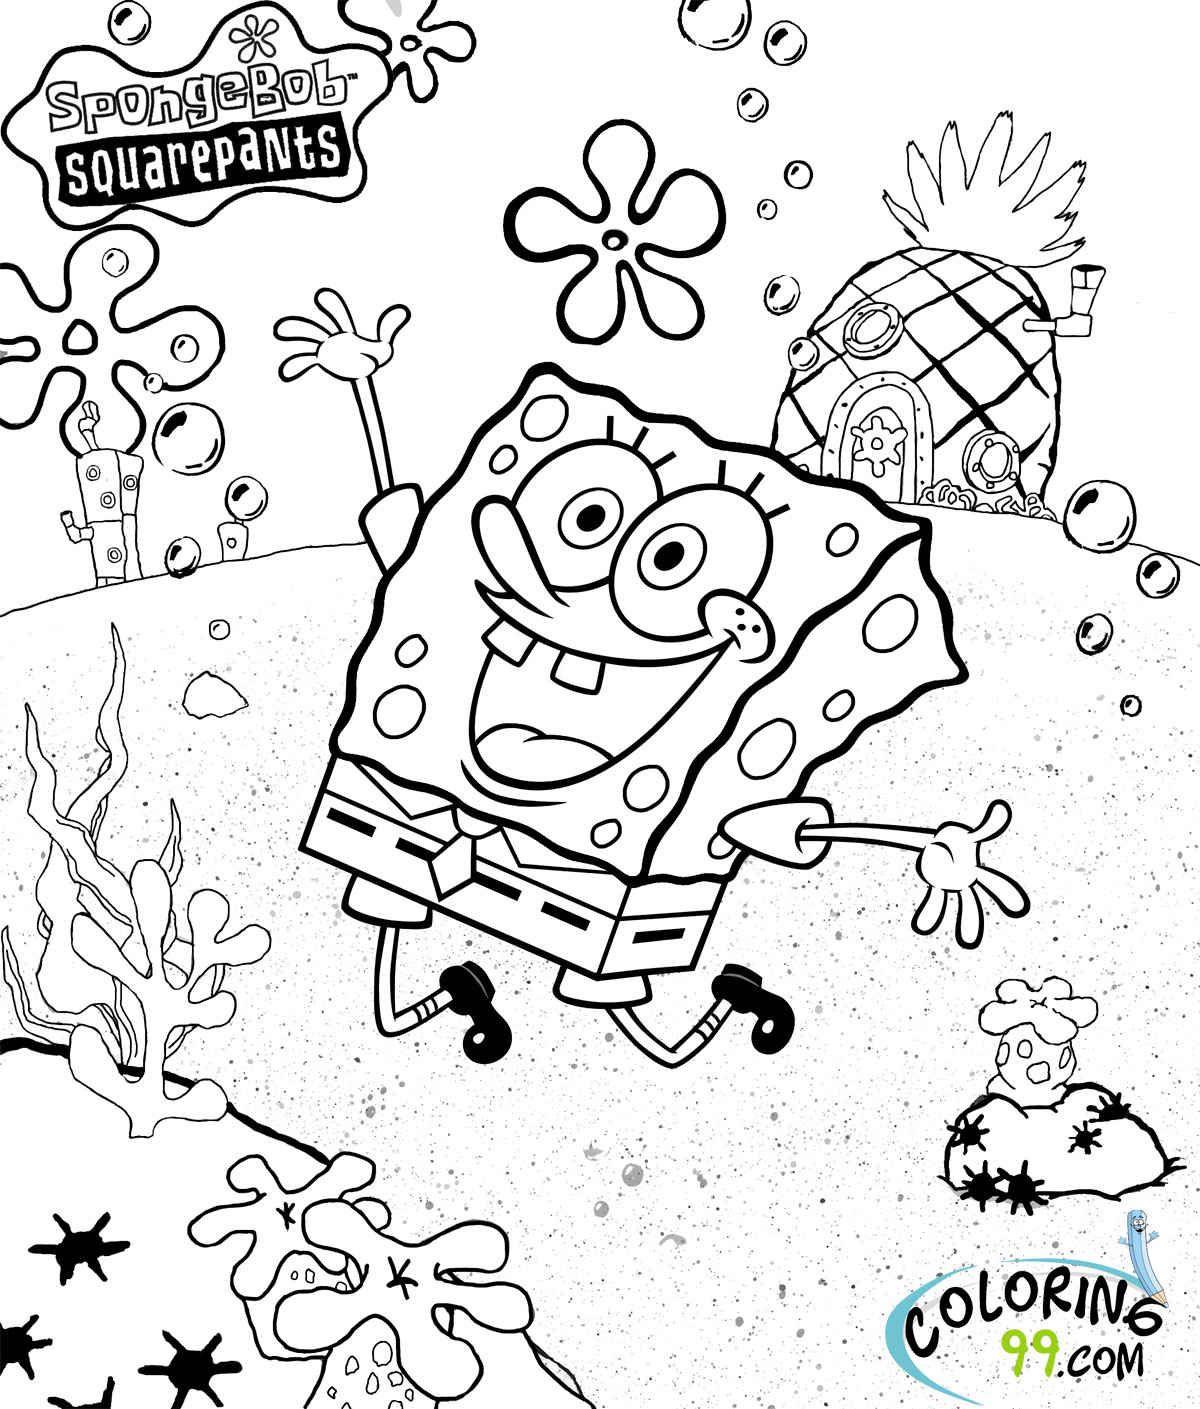 Coloring Pages Online Spongebob